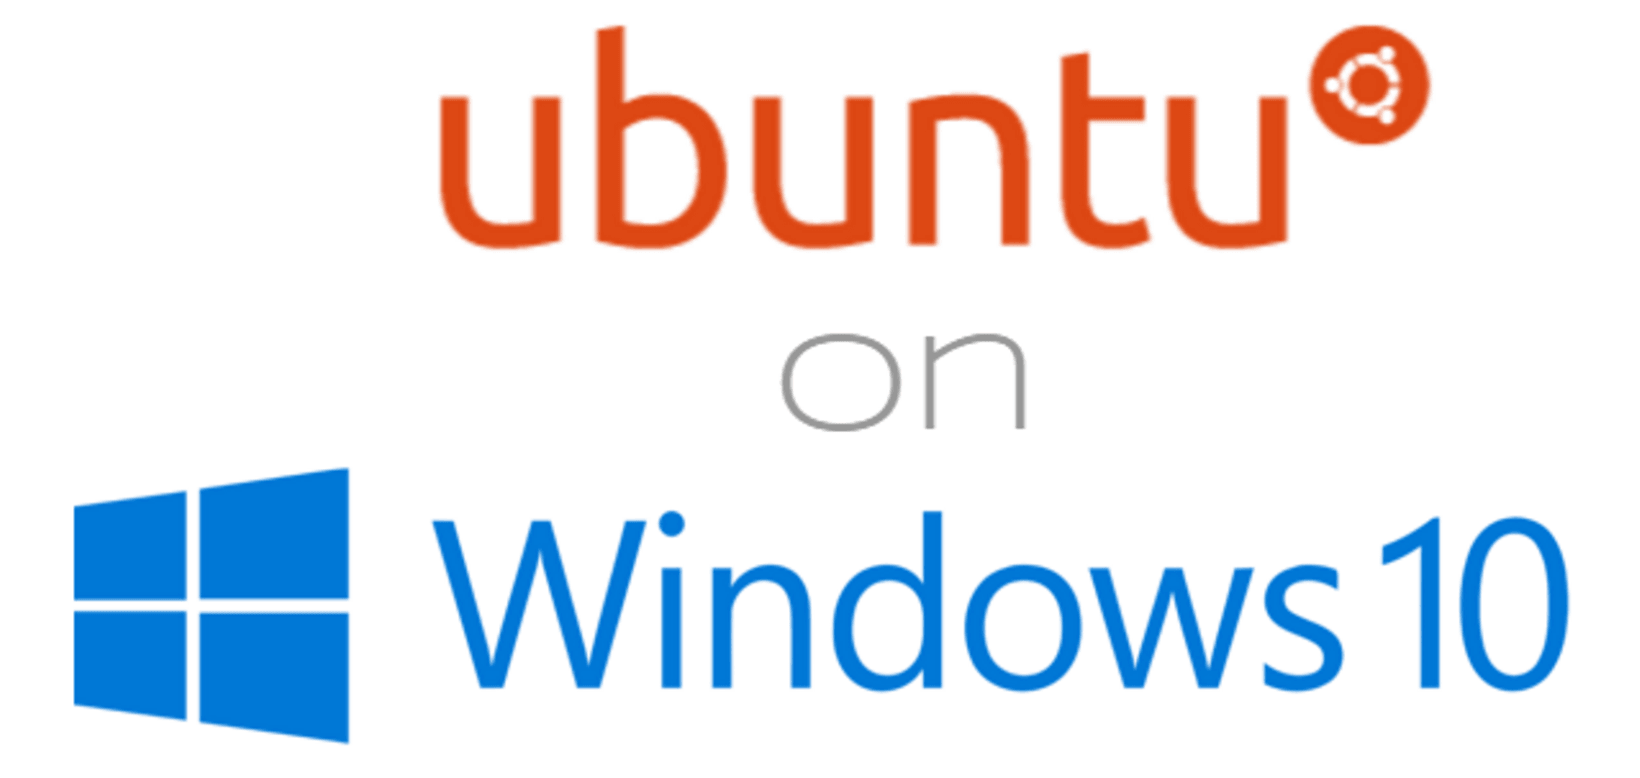 Windows 10 will soon let you run Ubuntu